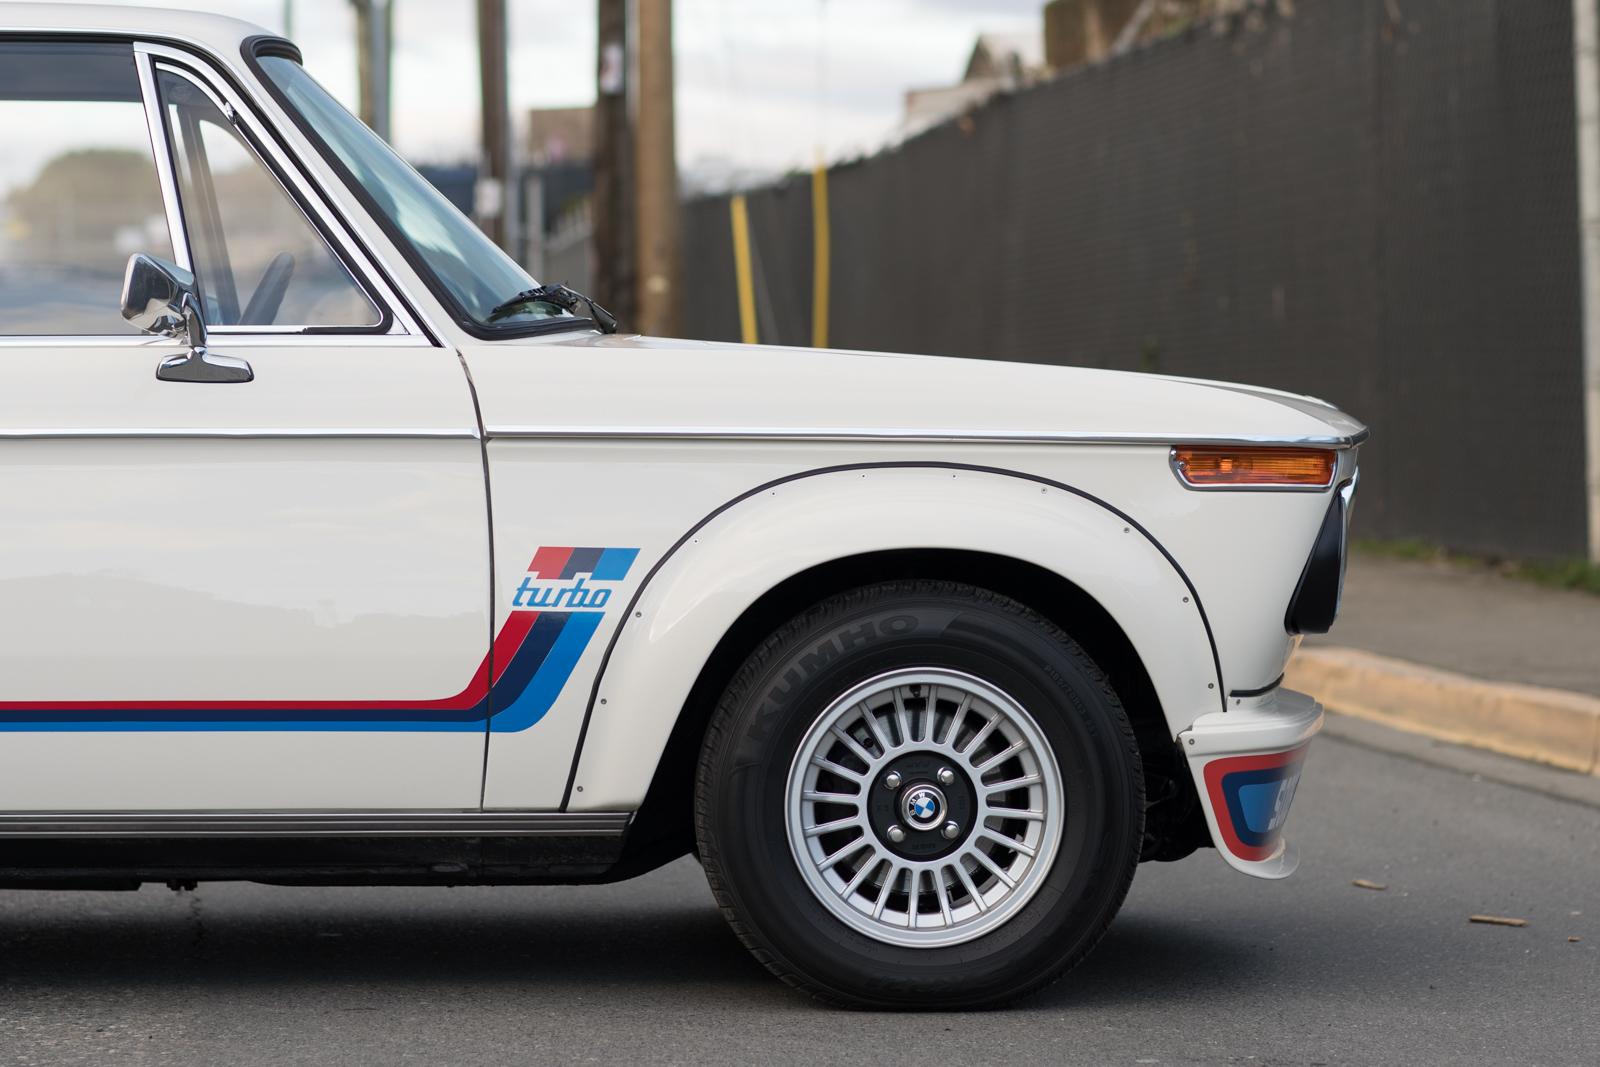 1974 BMW 2002 Turbo RH front corner and tire